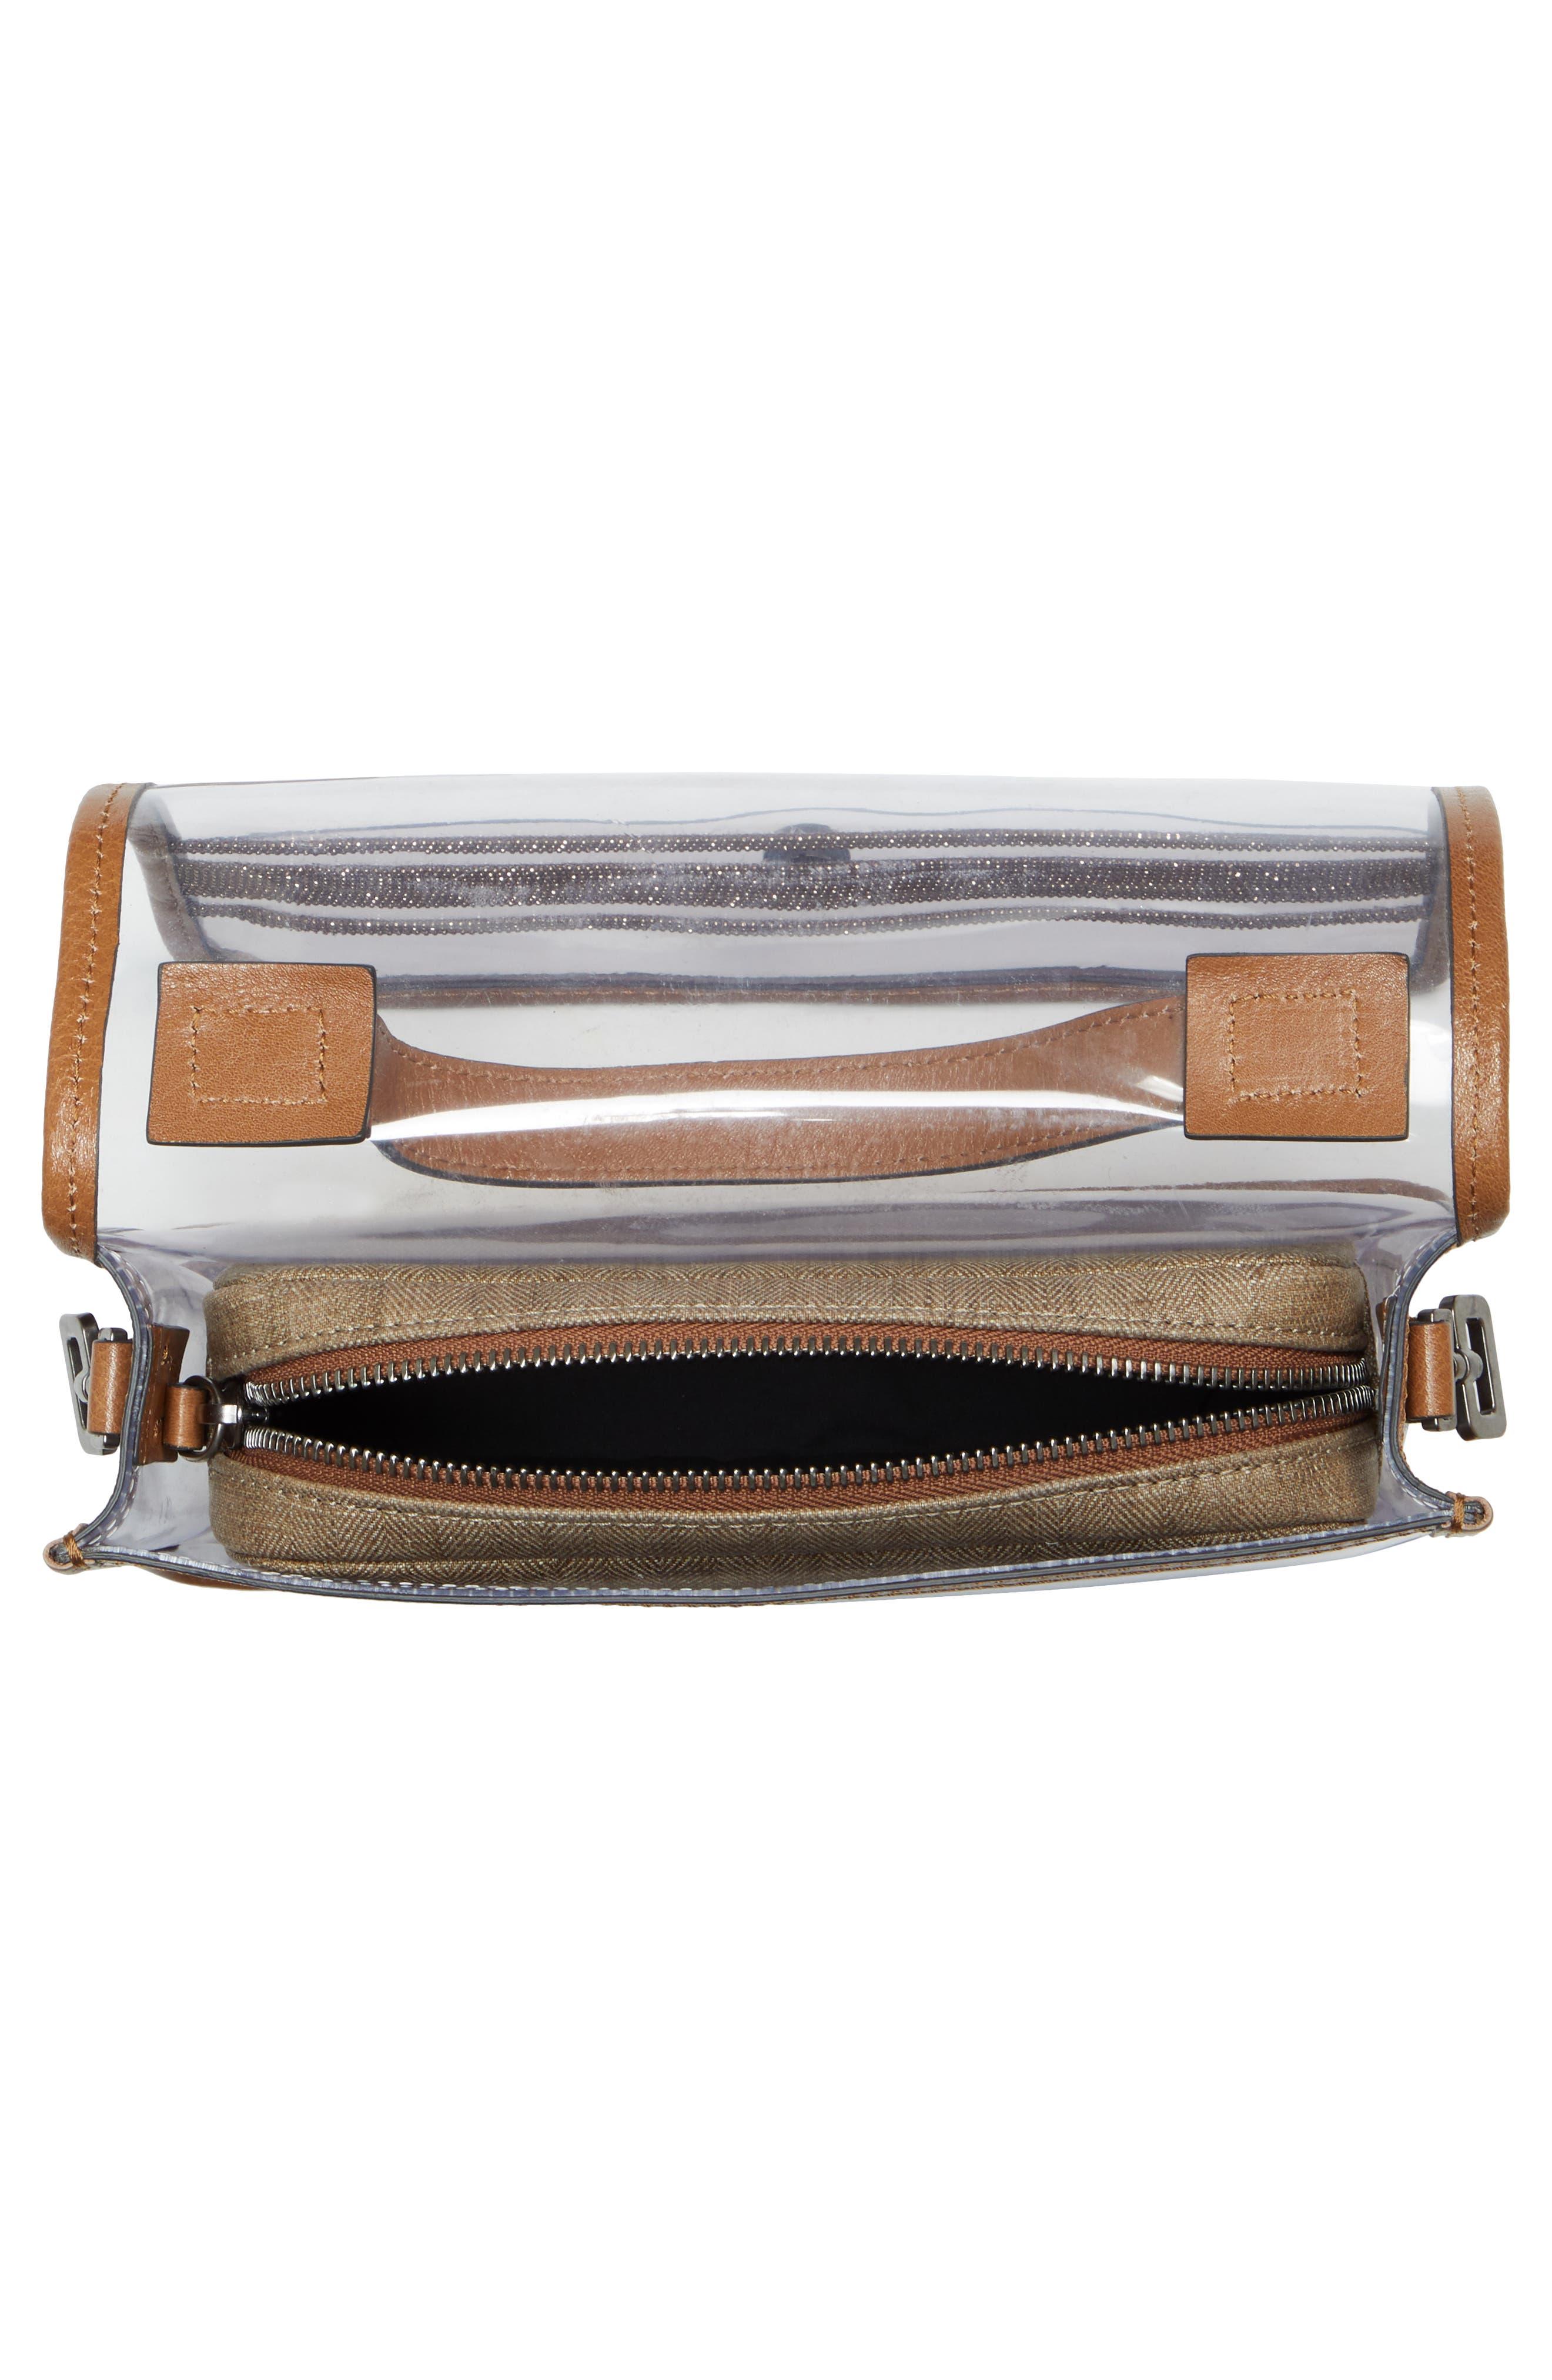 BRUNELLO CUCINELLI, Monili & Leather Trim Clear Shoulder Bag, Alternate thumbnail 4, color, LT BROWN